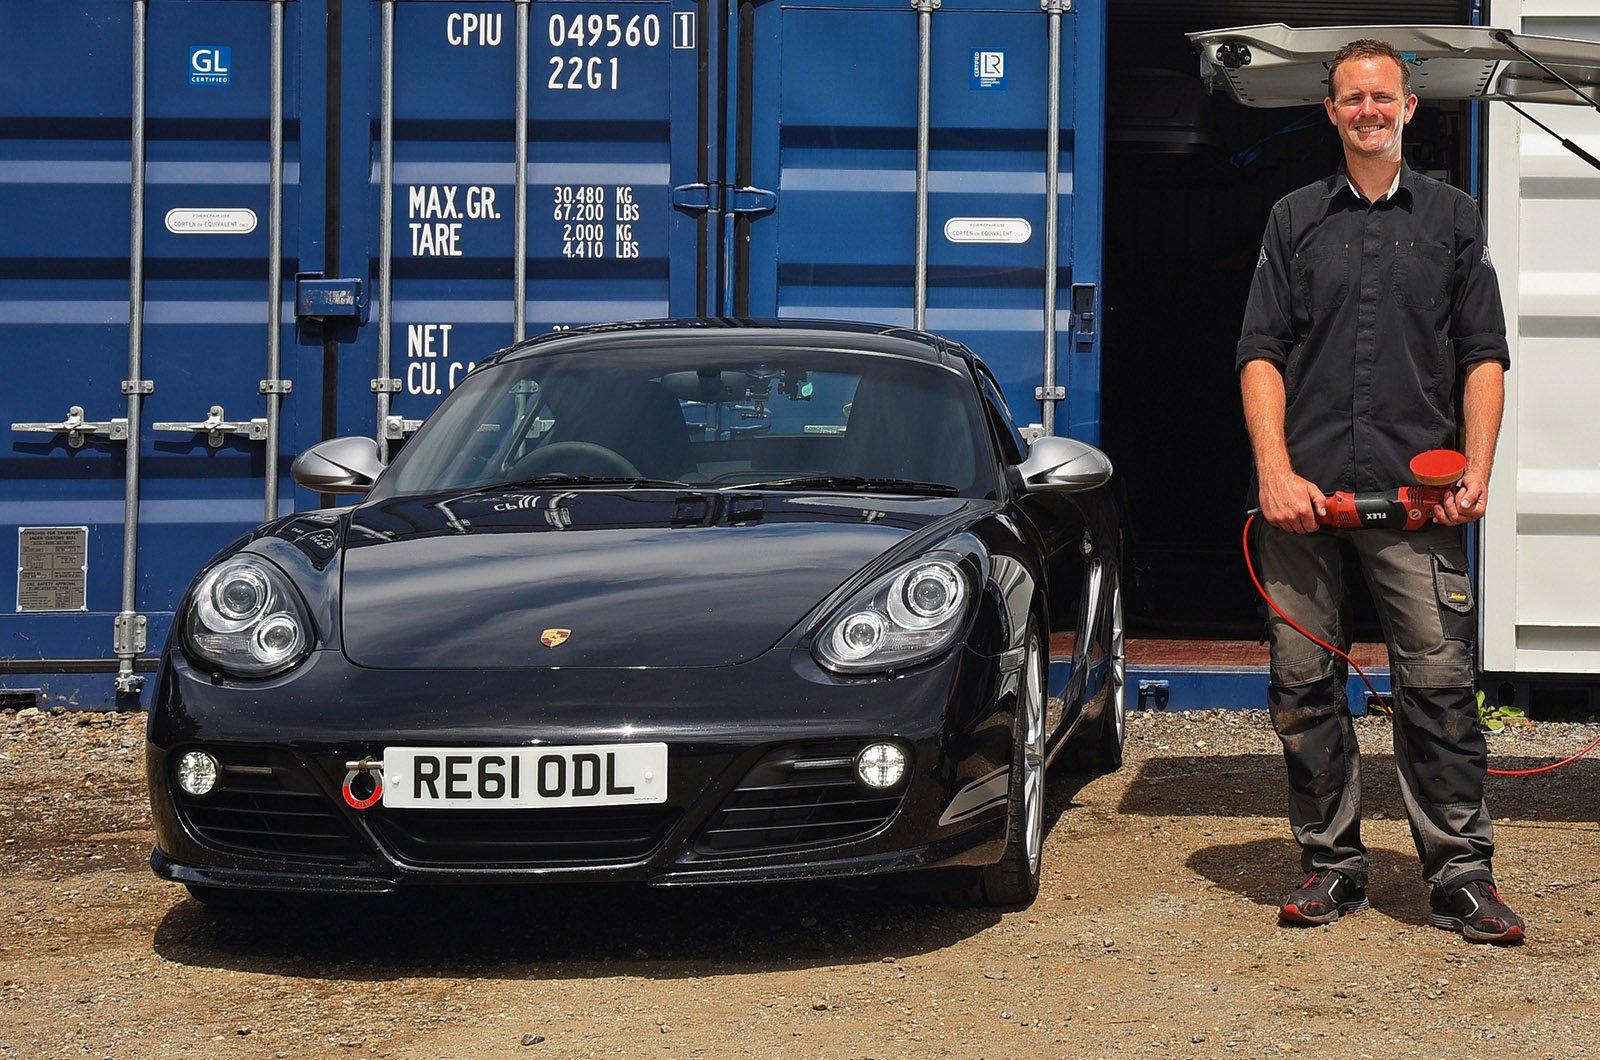 Car detailer with a Porsche Cayman